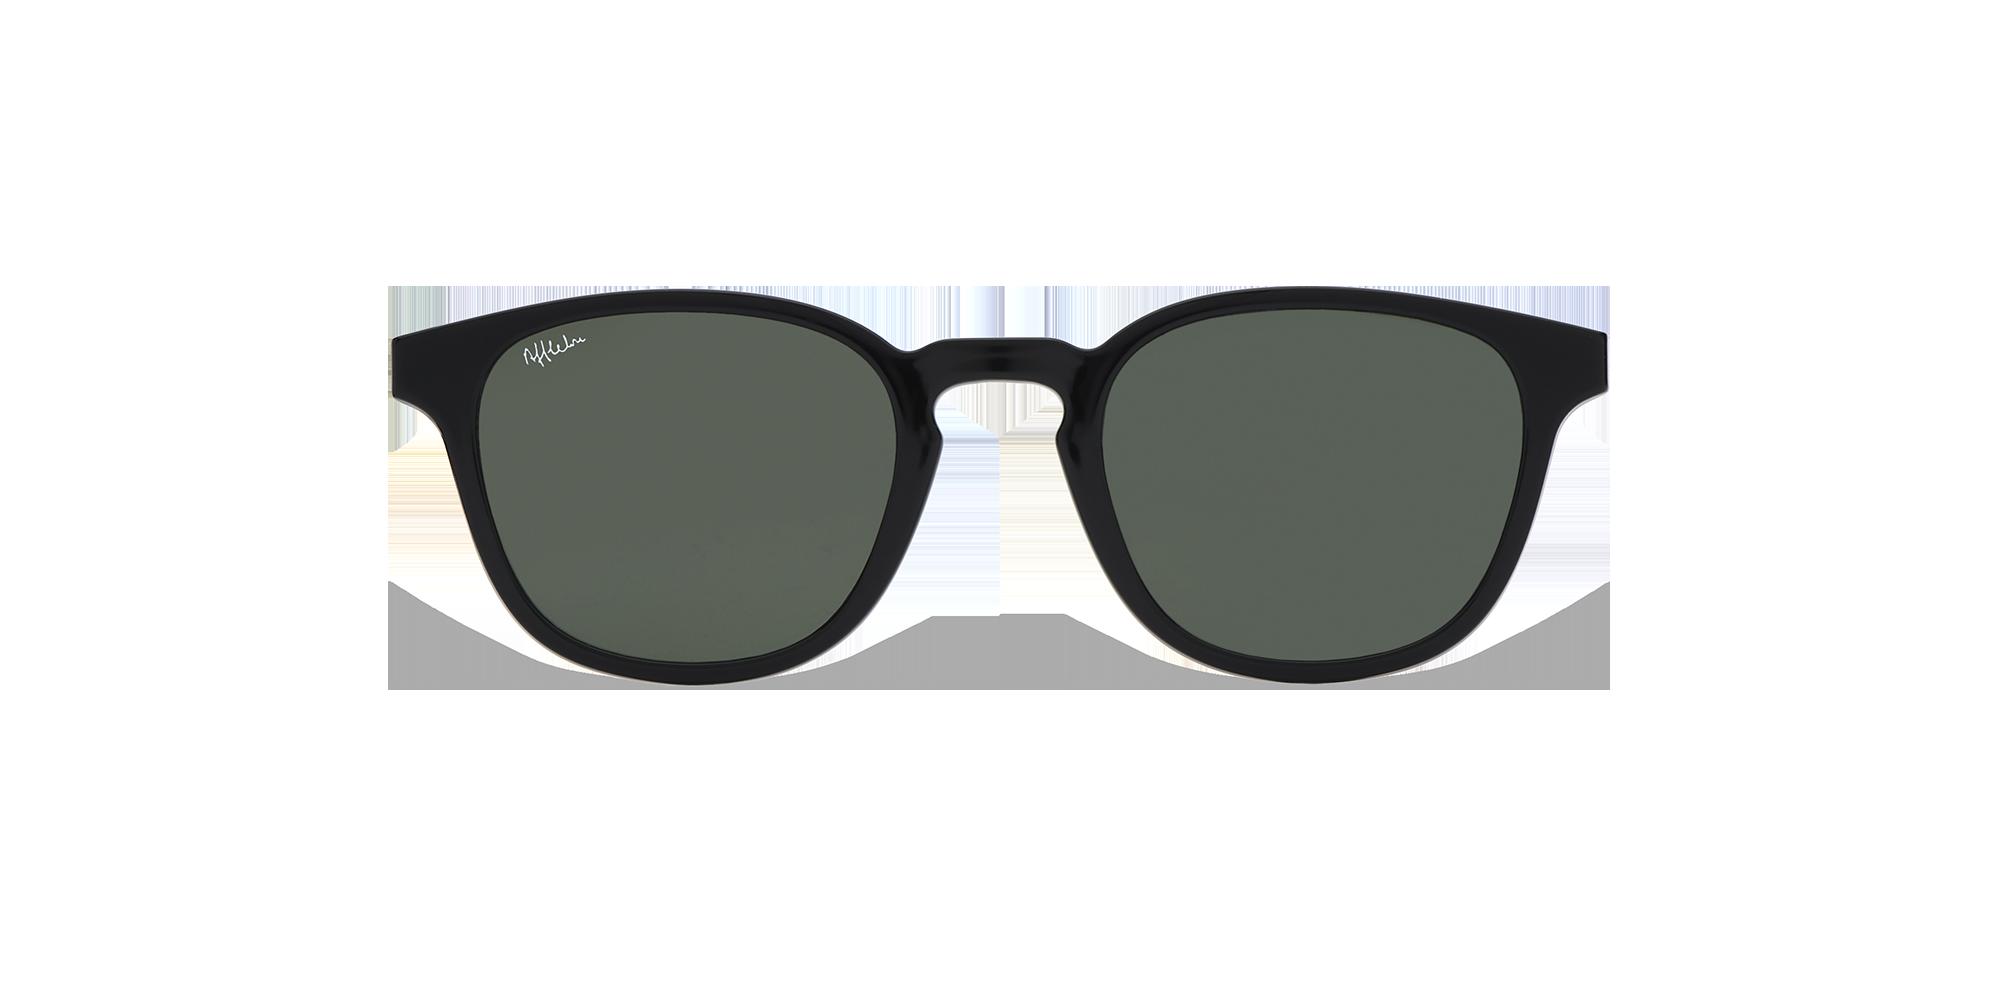 afflelou/france/products/smart_clip/clips_glasses/07630036429129_face.png